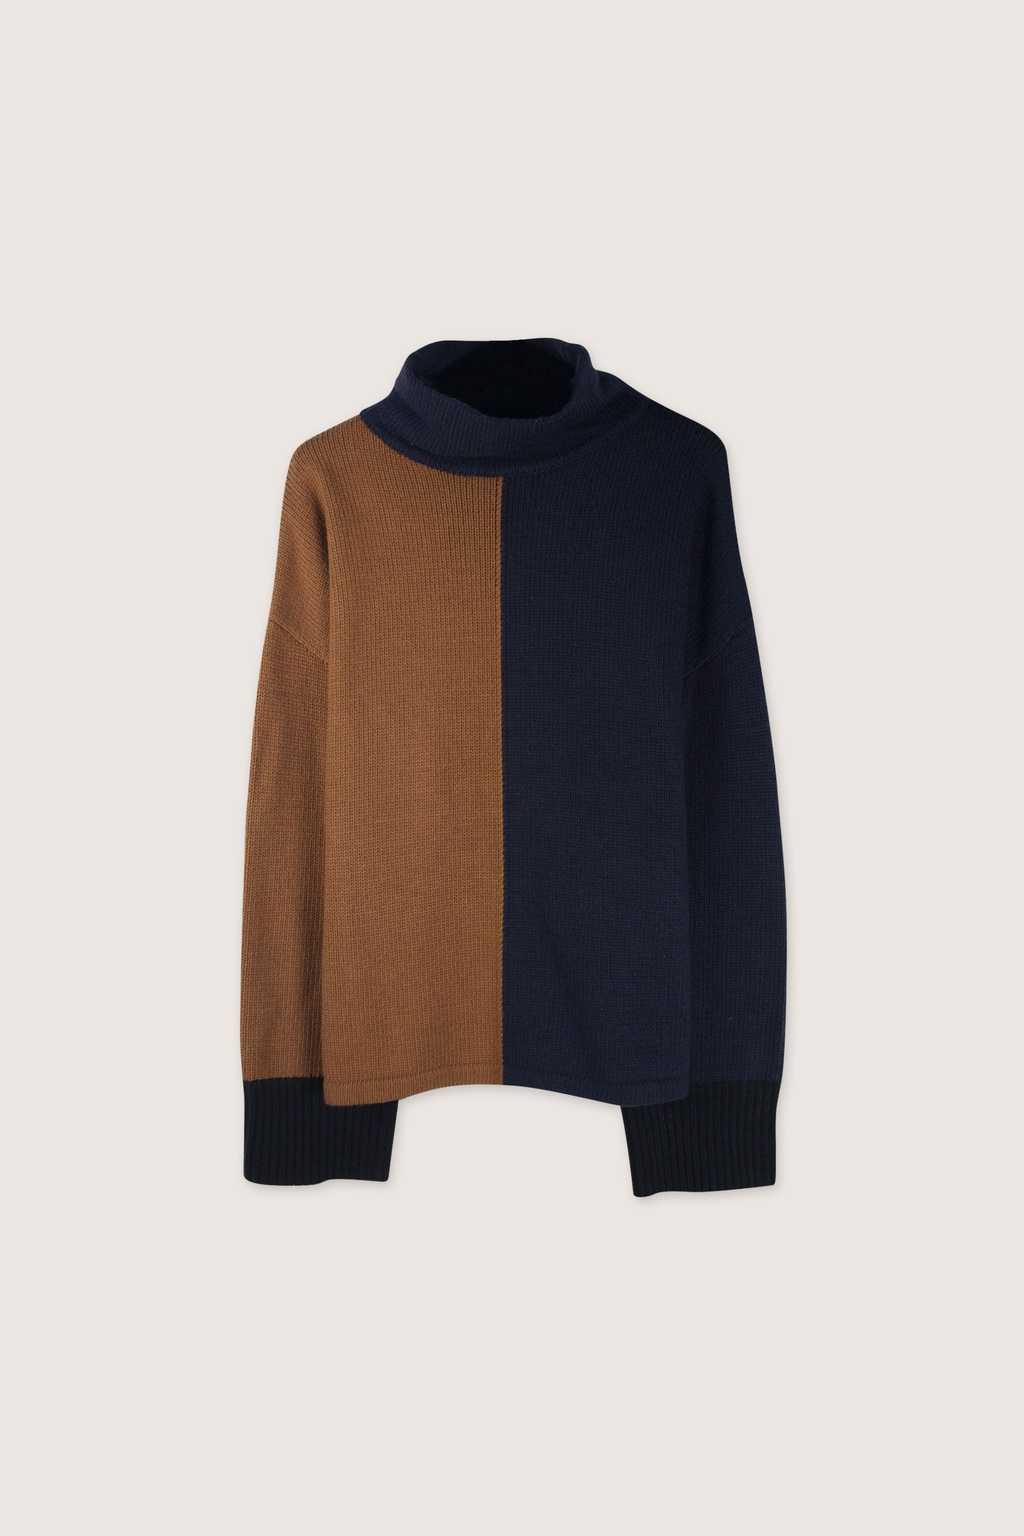 Sweater 1745 Navy 5